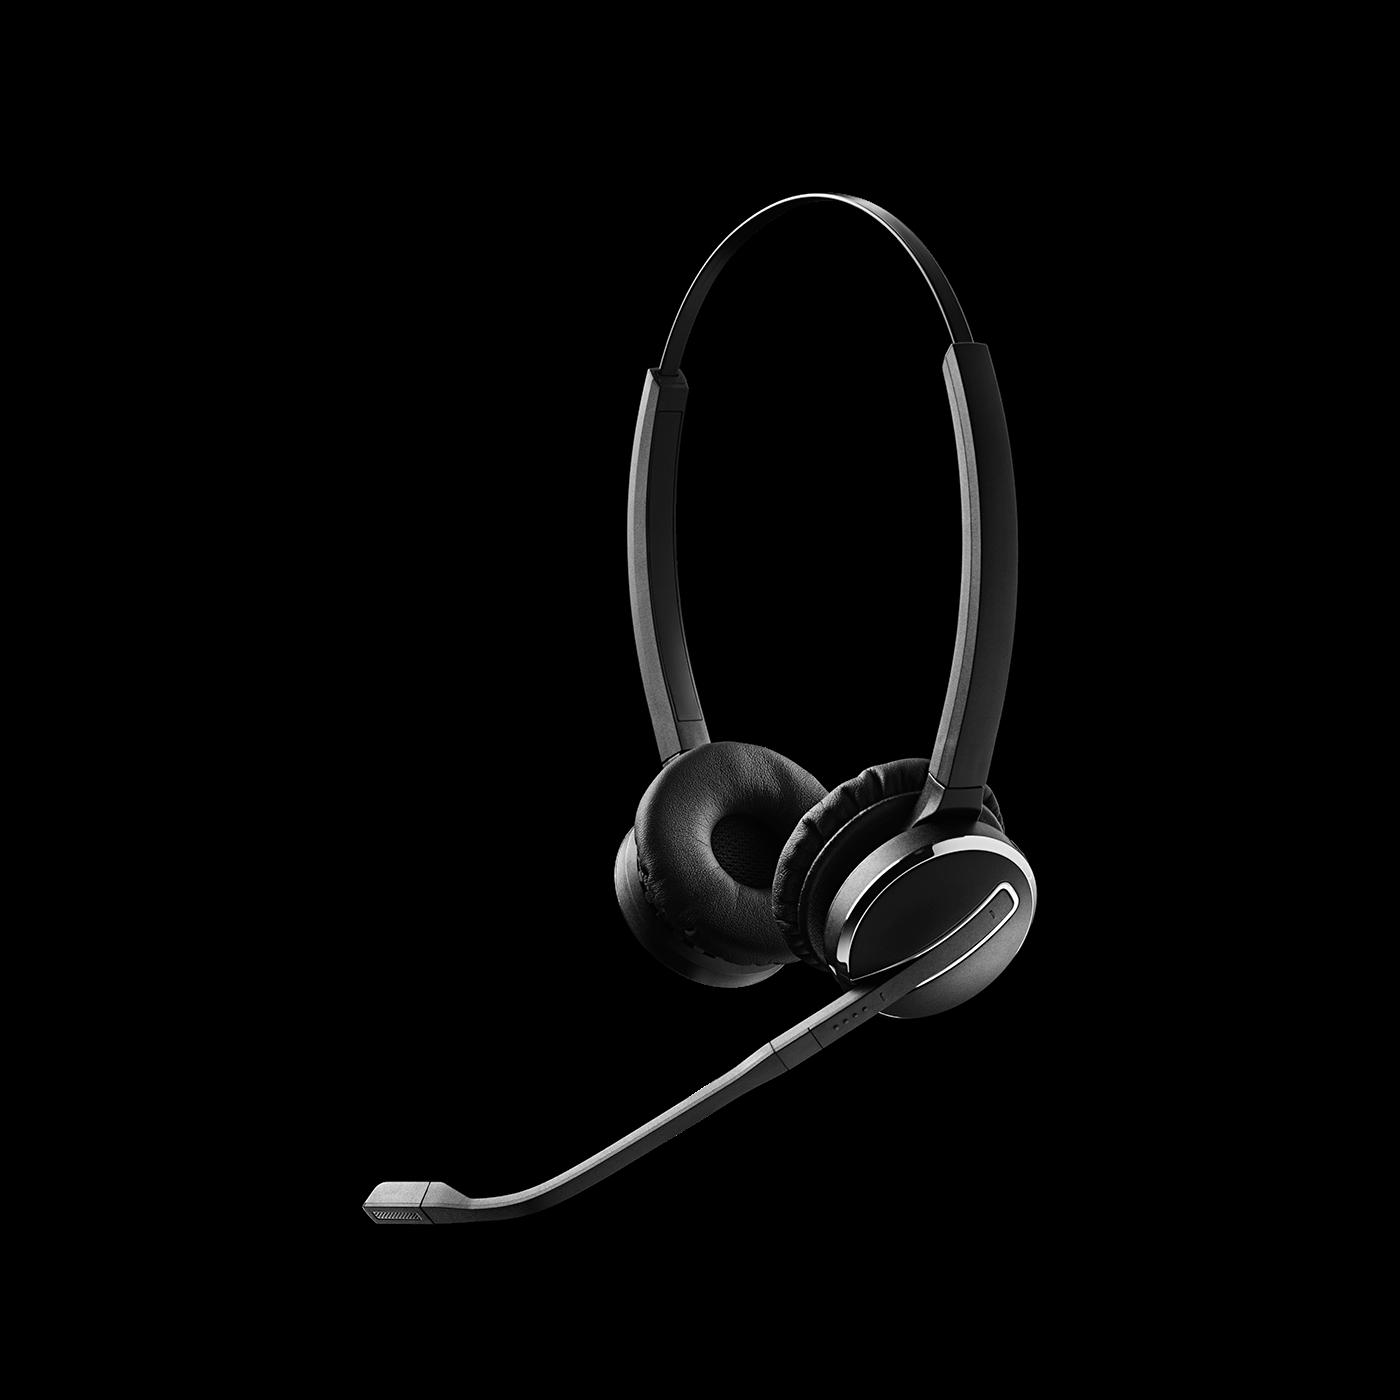 Bluetooth headphones jvc wireless - Jabra PRO 9450 - headset Overview